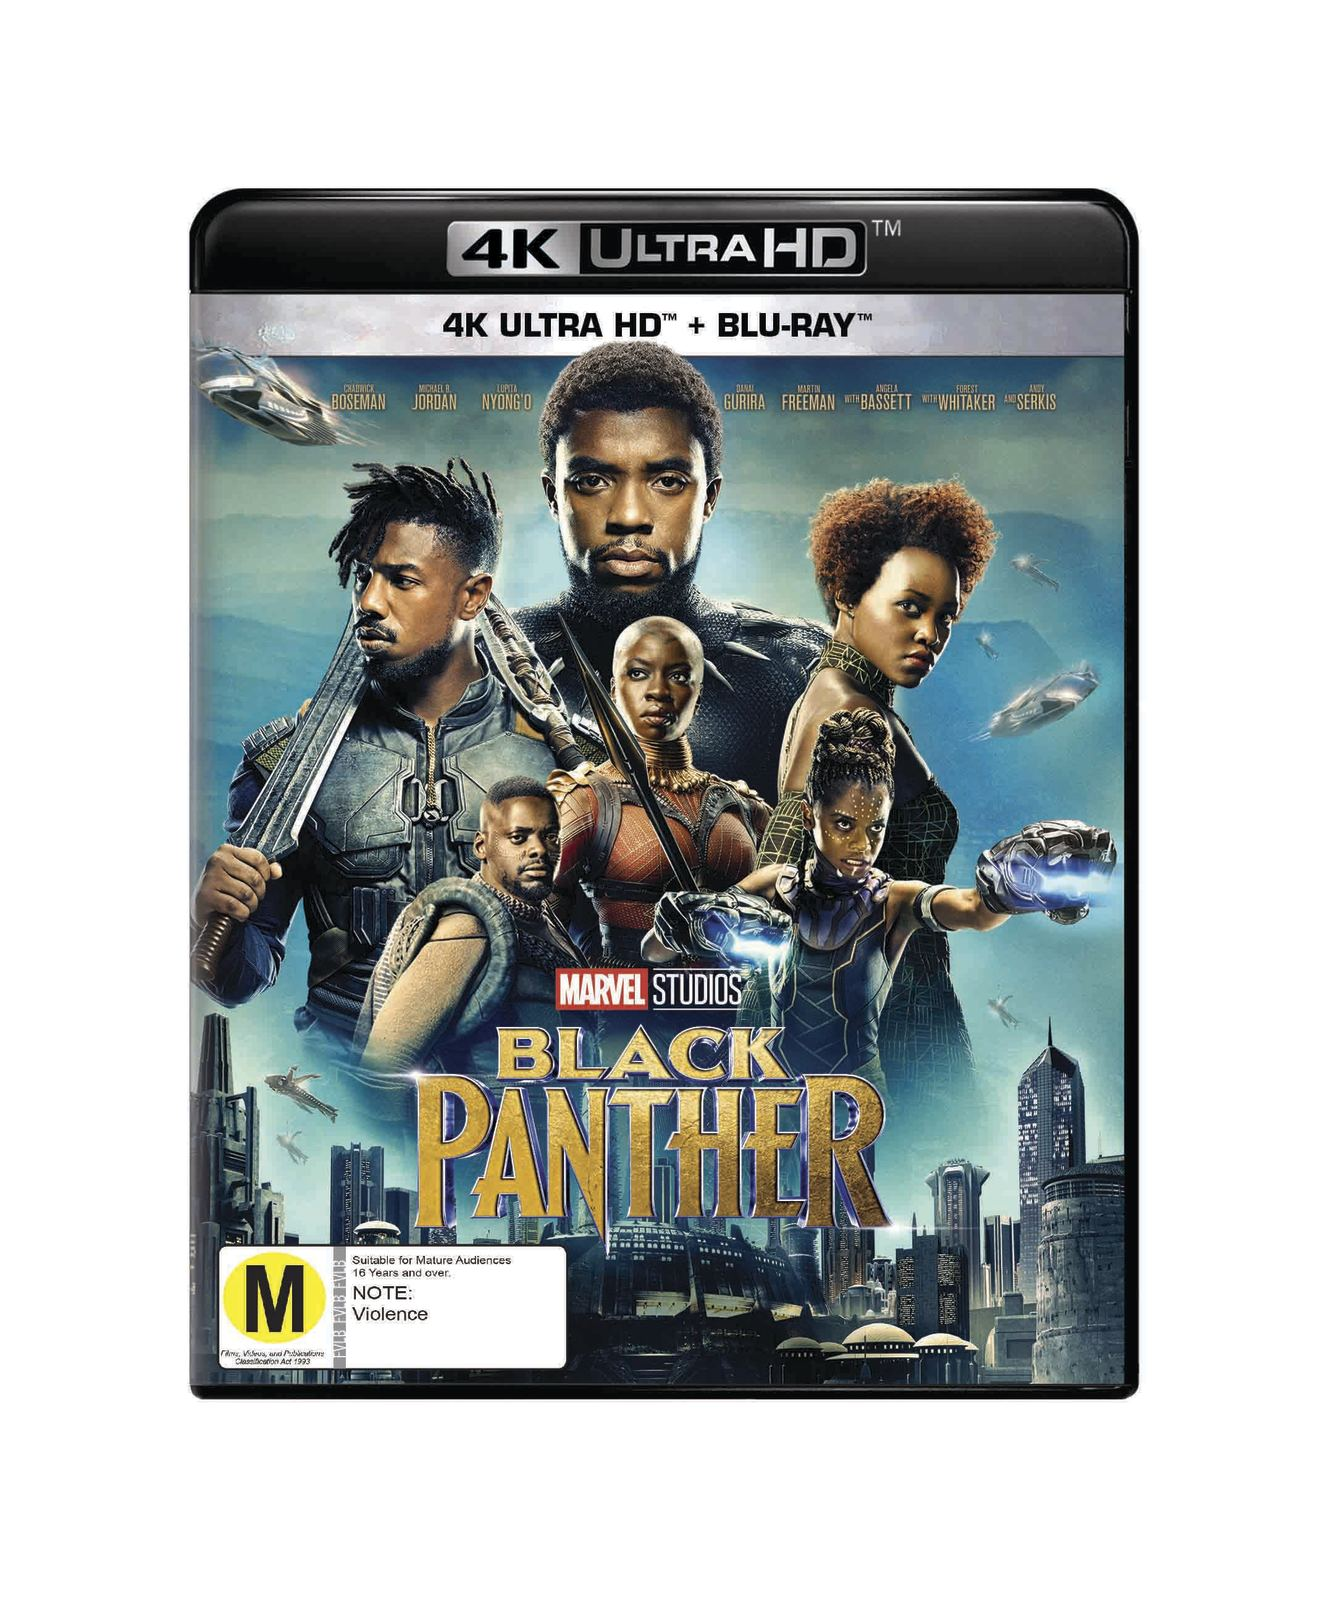 Black Panther (4K UHD + Blu-ray) on UHD Blu-ray image